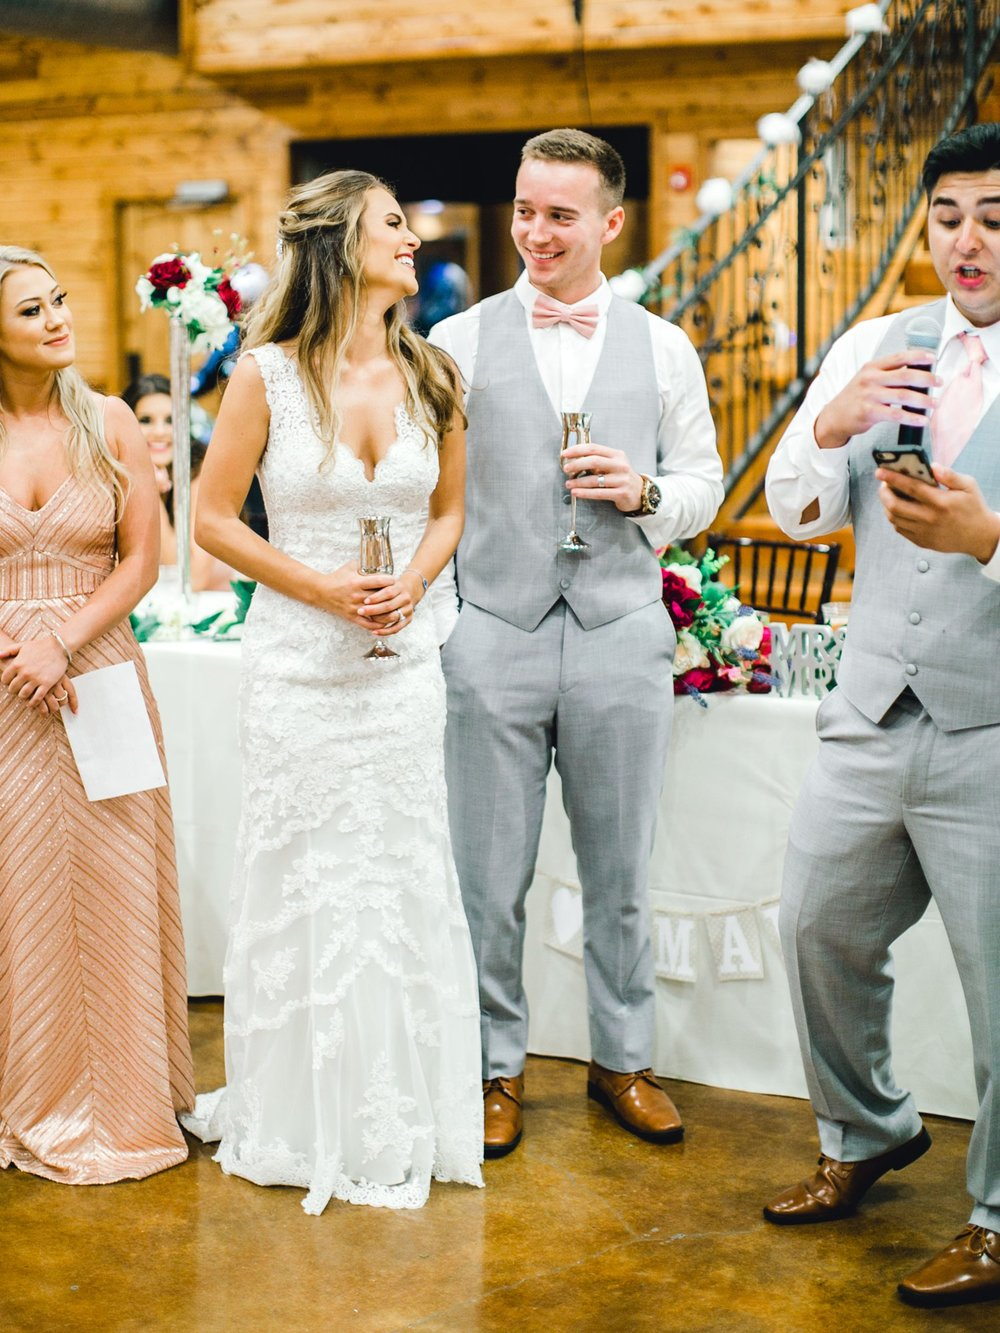 Aleah_and_Rowdy_Fenwick_Hidden_Creek_Events_Heath_Texas_Lubbock_Photographer_ALLEEJ_Weddings_0136.jpg